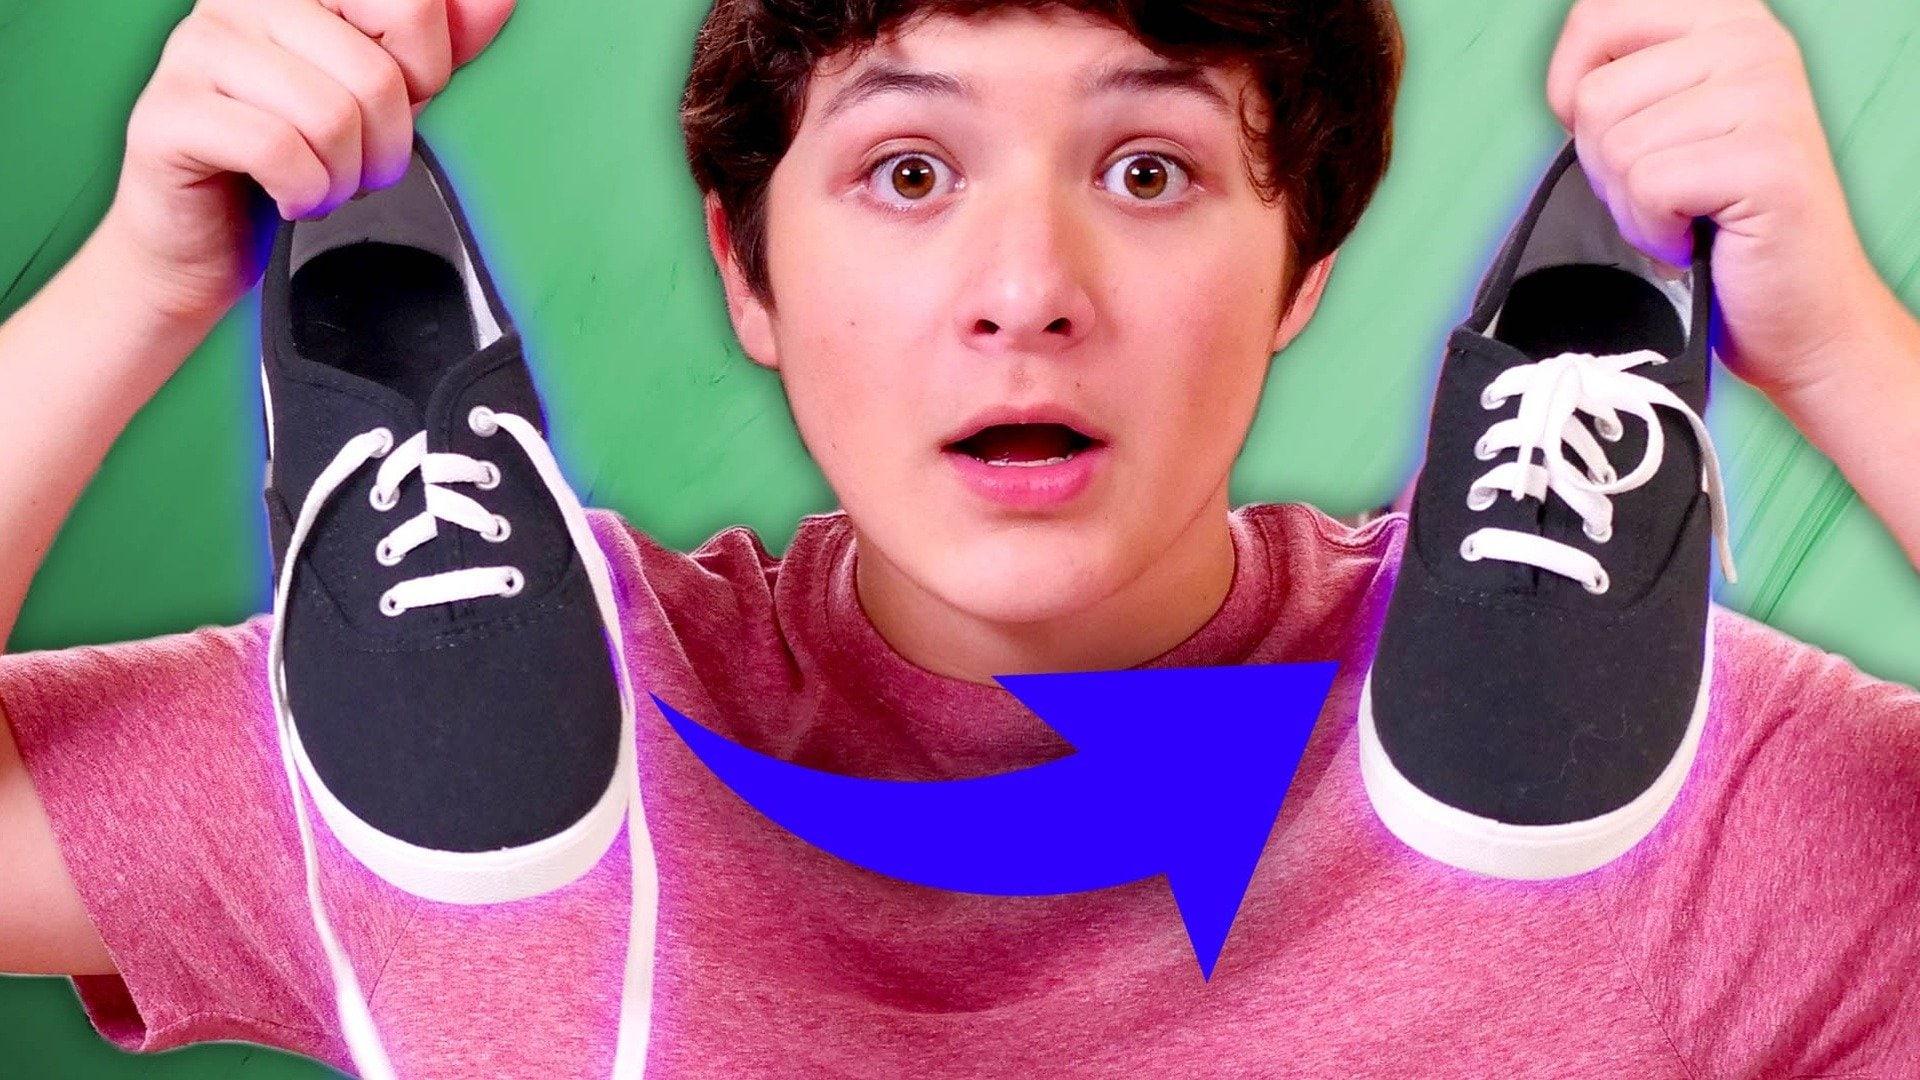 Magic Self-Tying Shoe Laces Trick